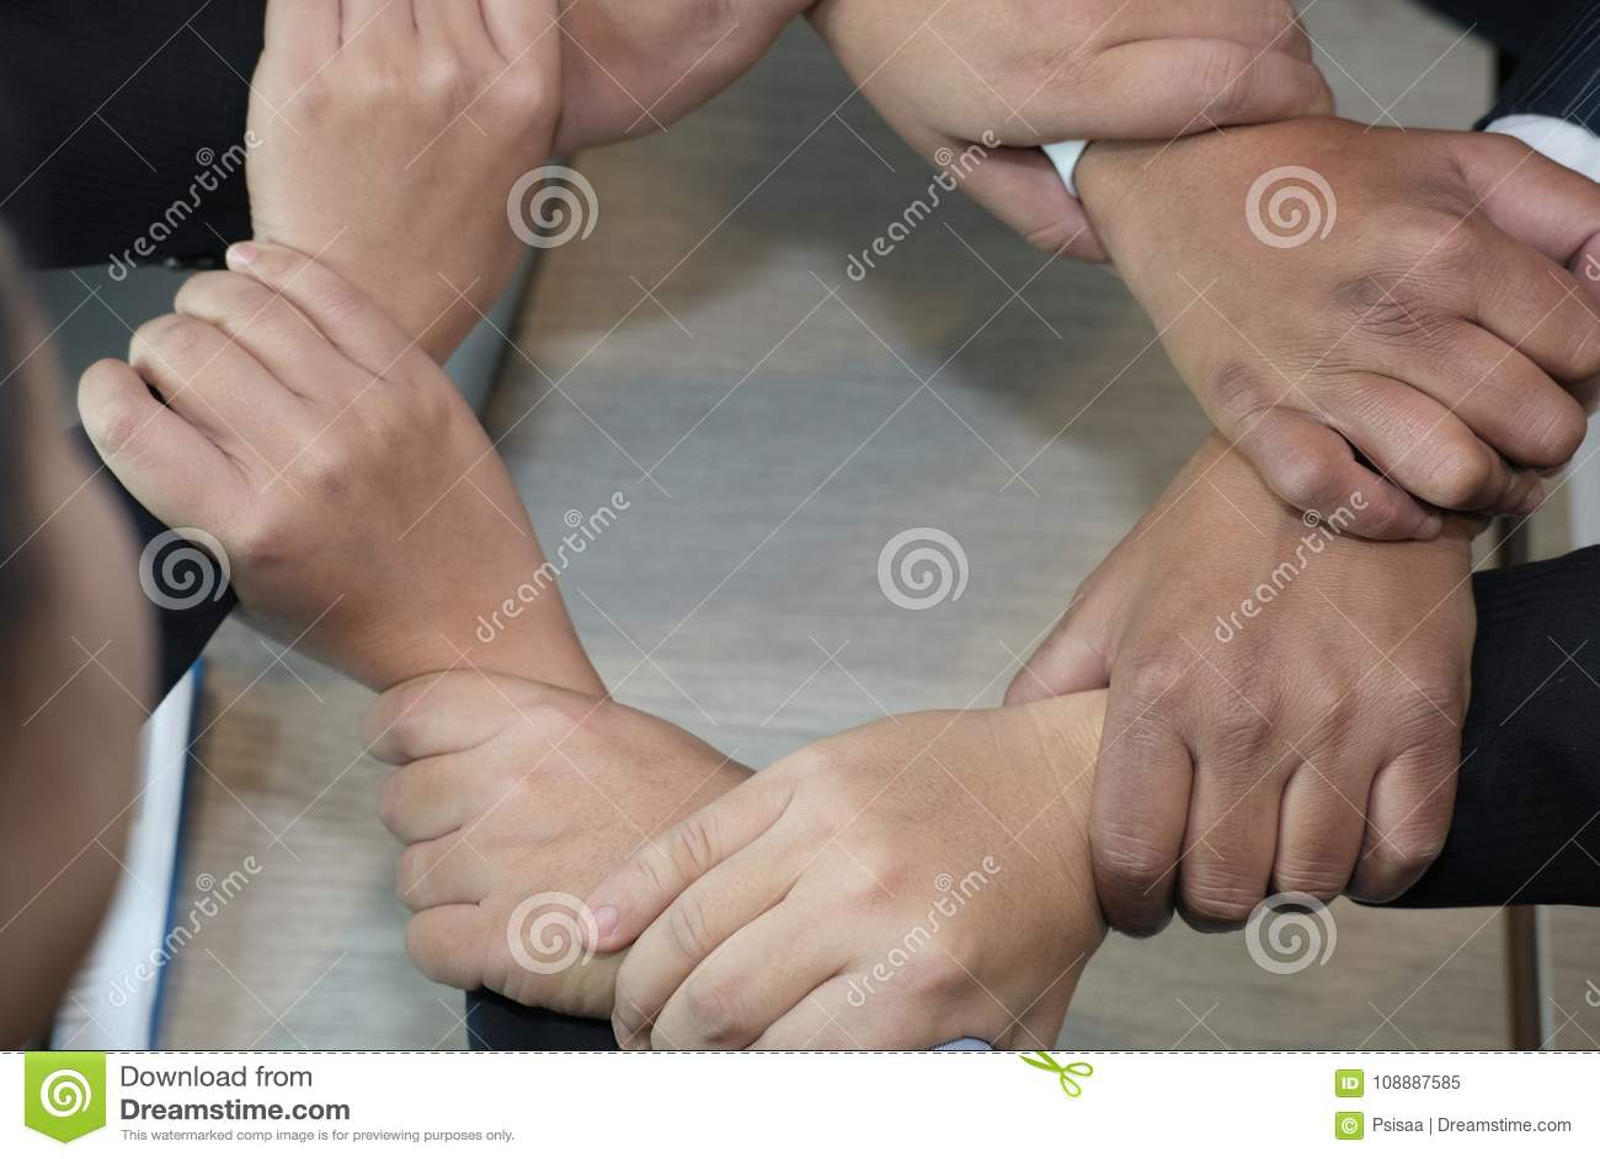 A Secret Handshake | The Village Granny |Touching Hands Together